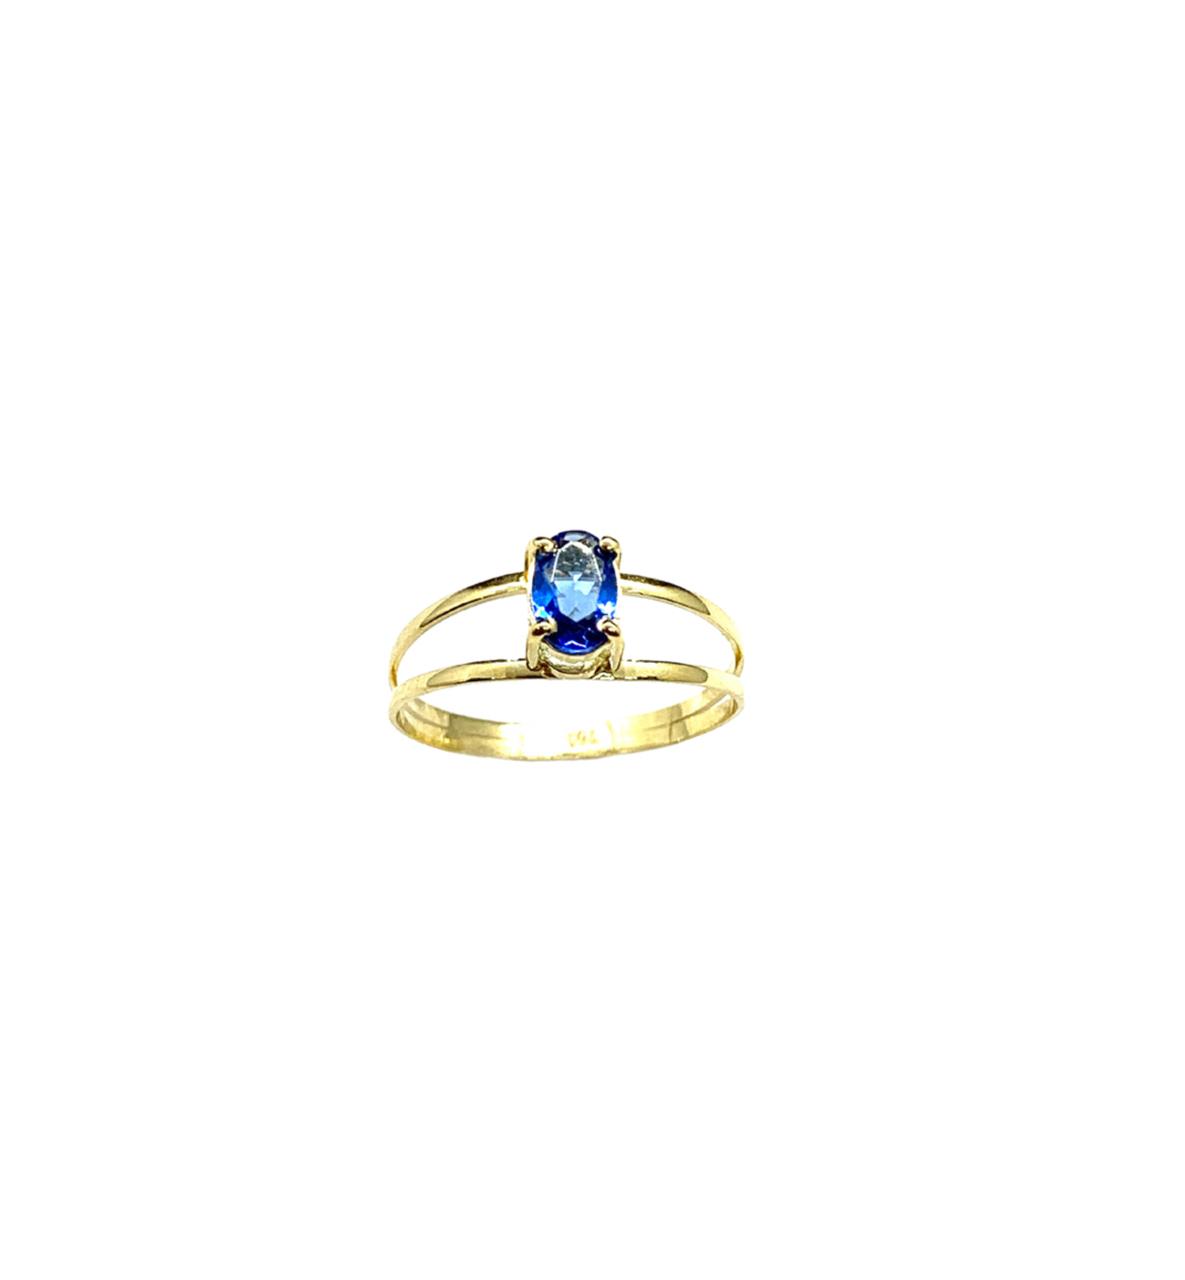 Anel Ouro 18k Pedra Oval Safira 61008ANAB204001-43